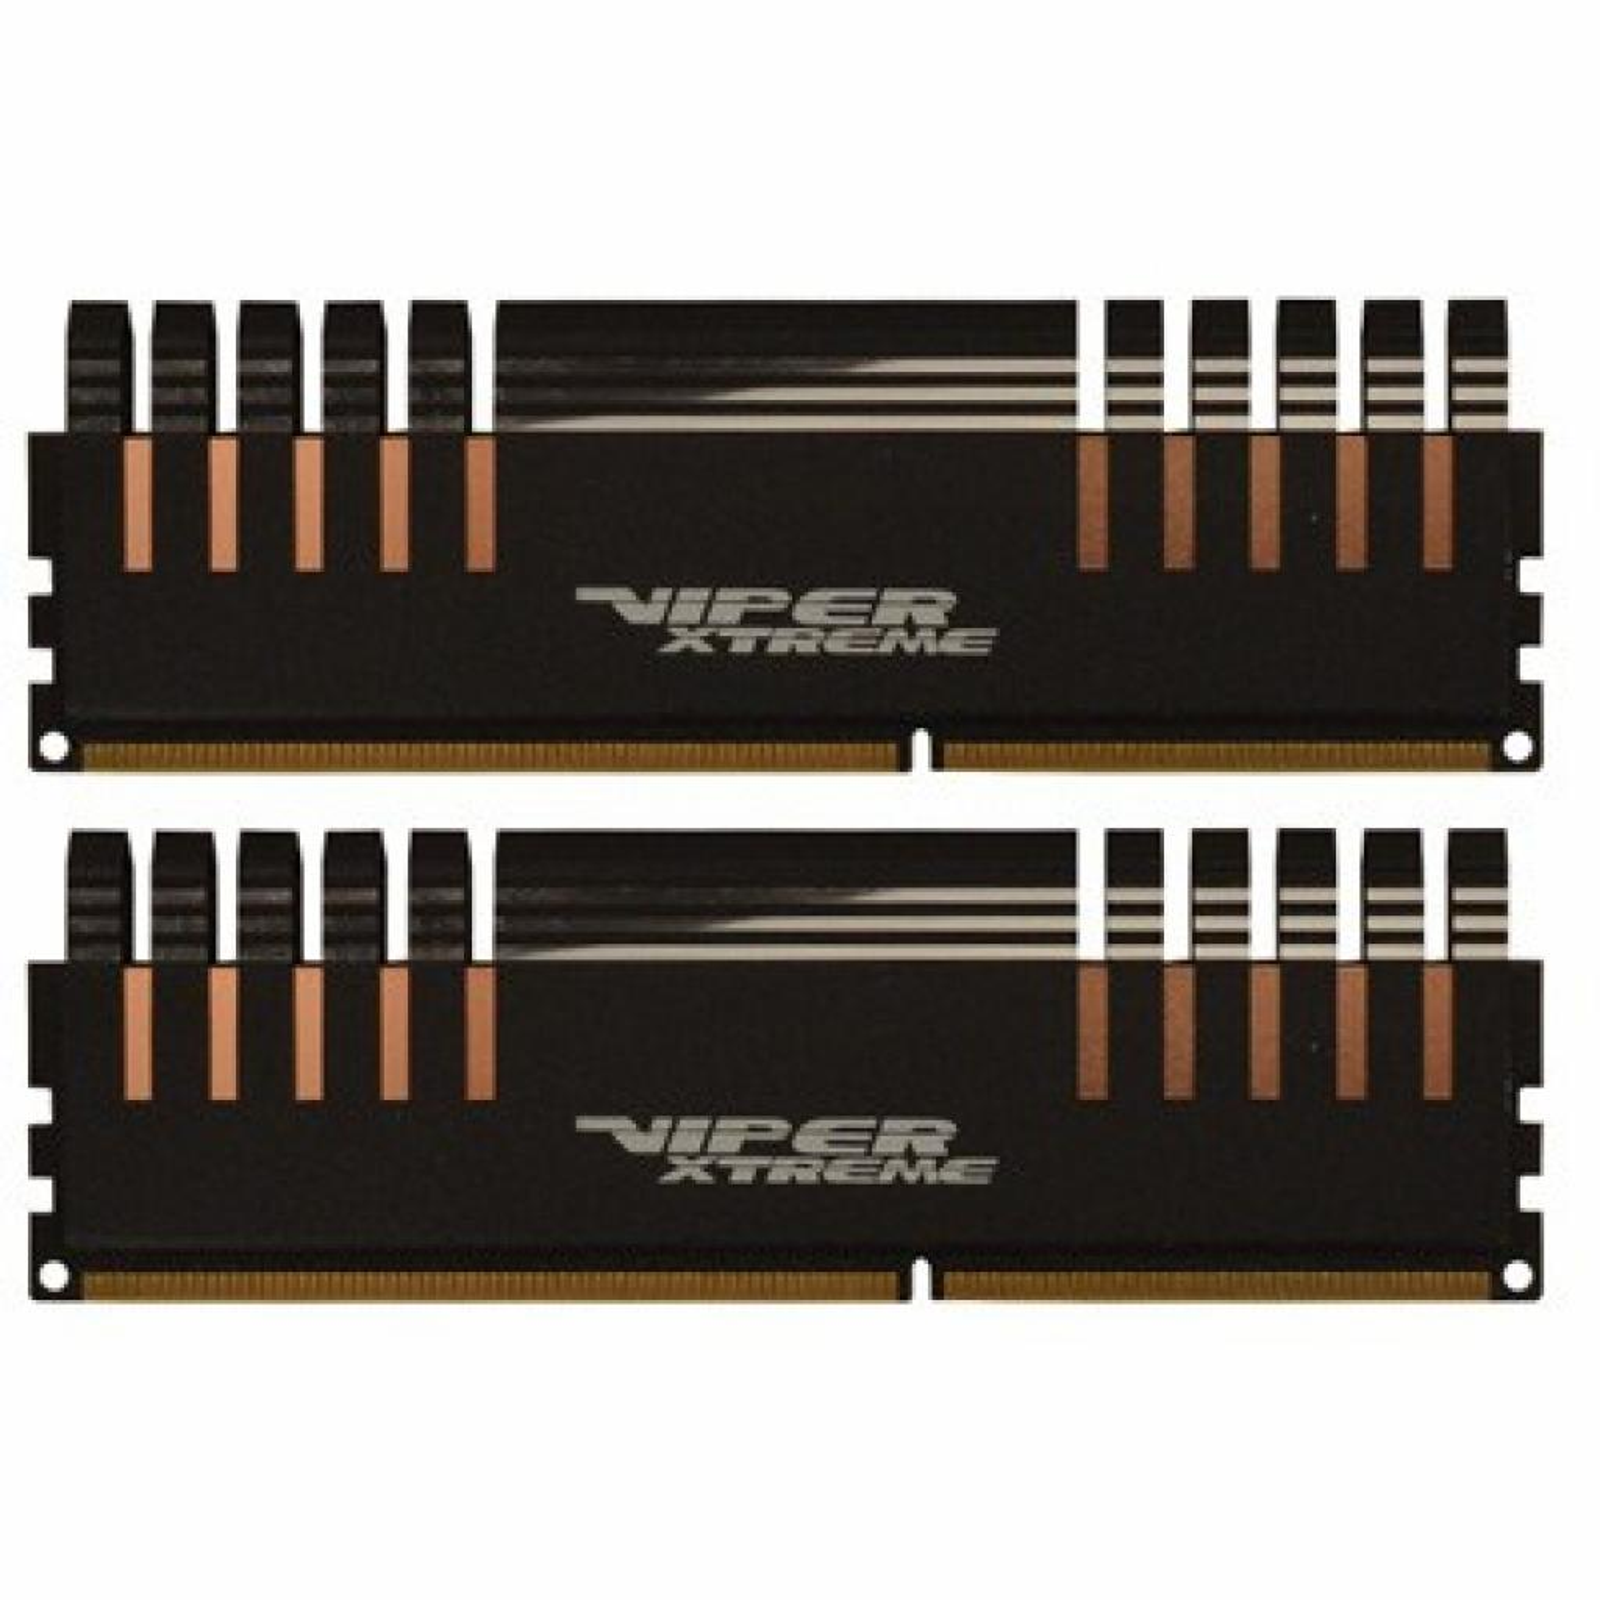 Модуль памяти для компьютера DDR3 8GB (2x4GB) 2400 MHz Patriot (PXD38G2400C11K)